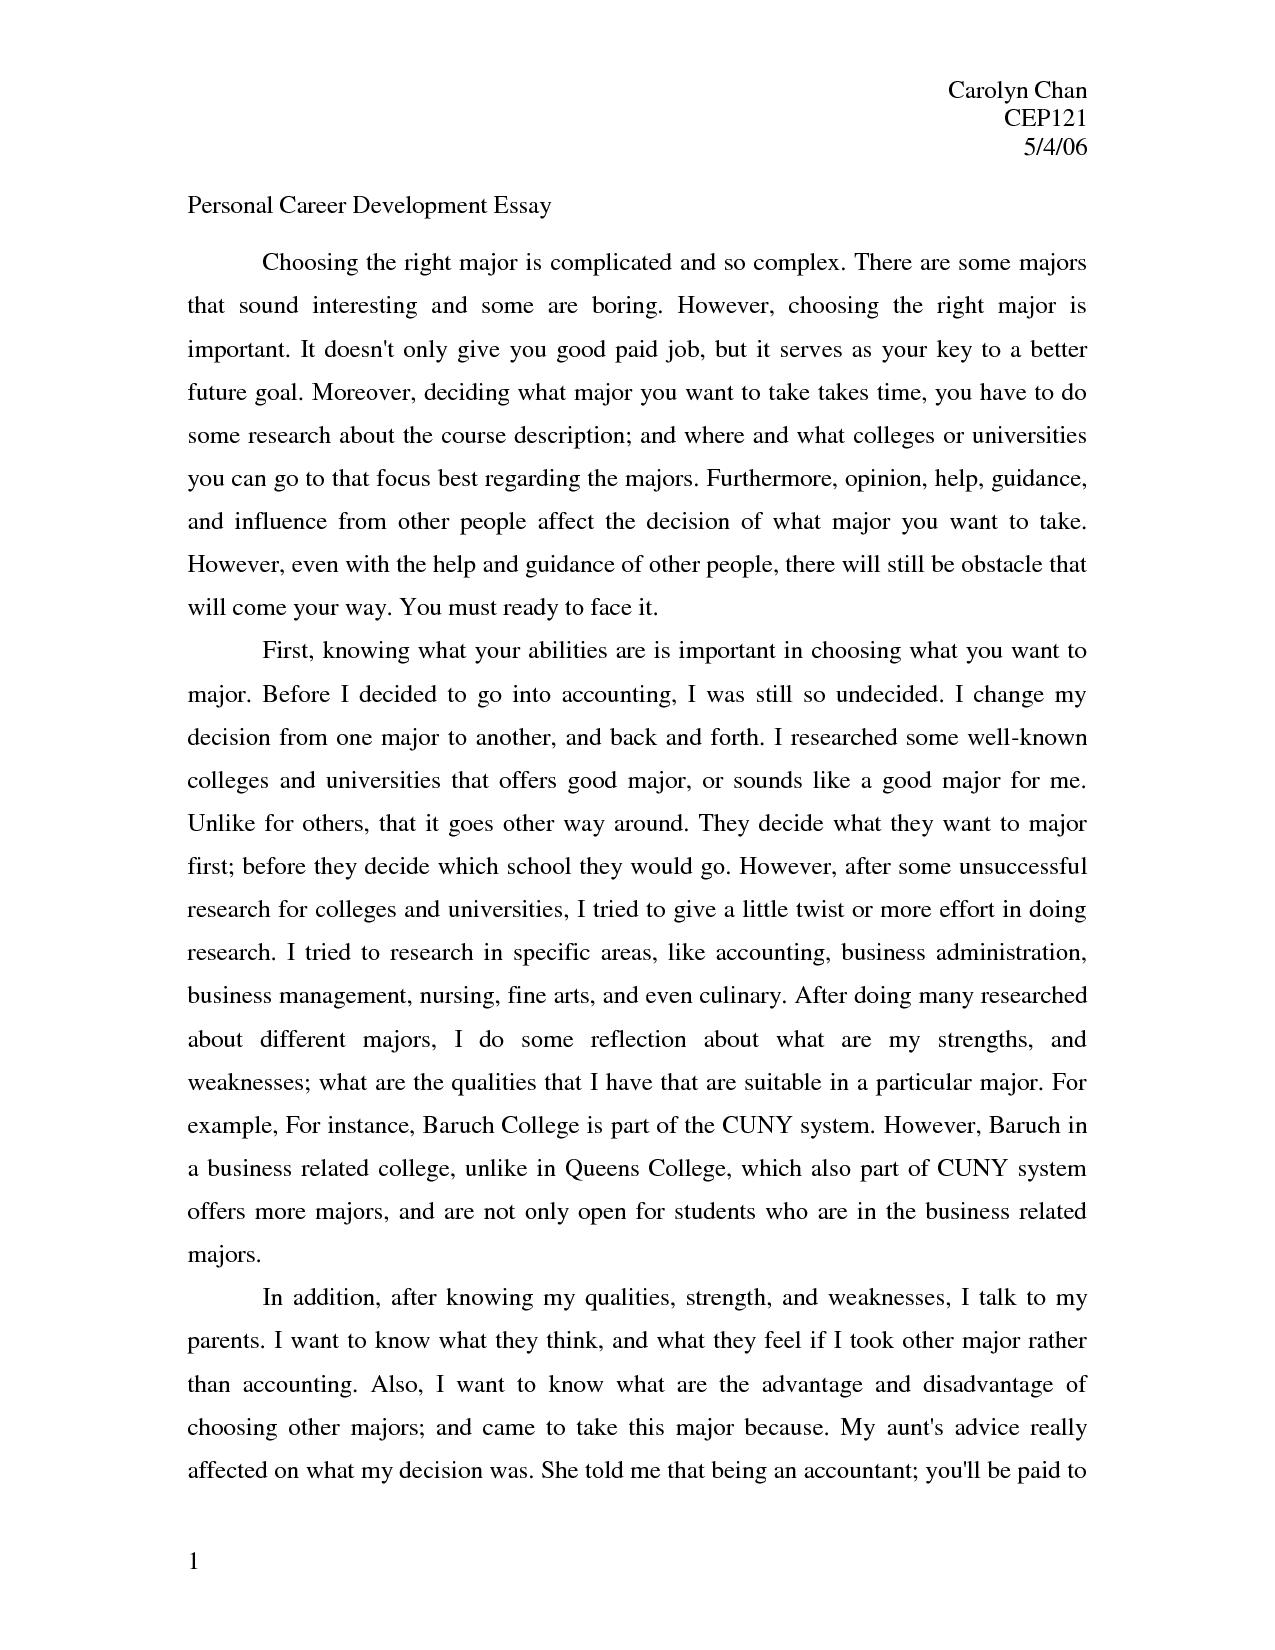 Best job essay